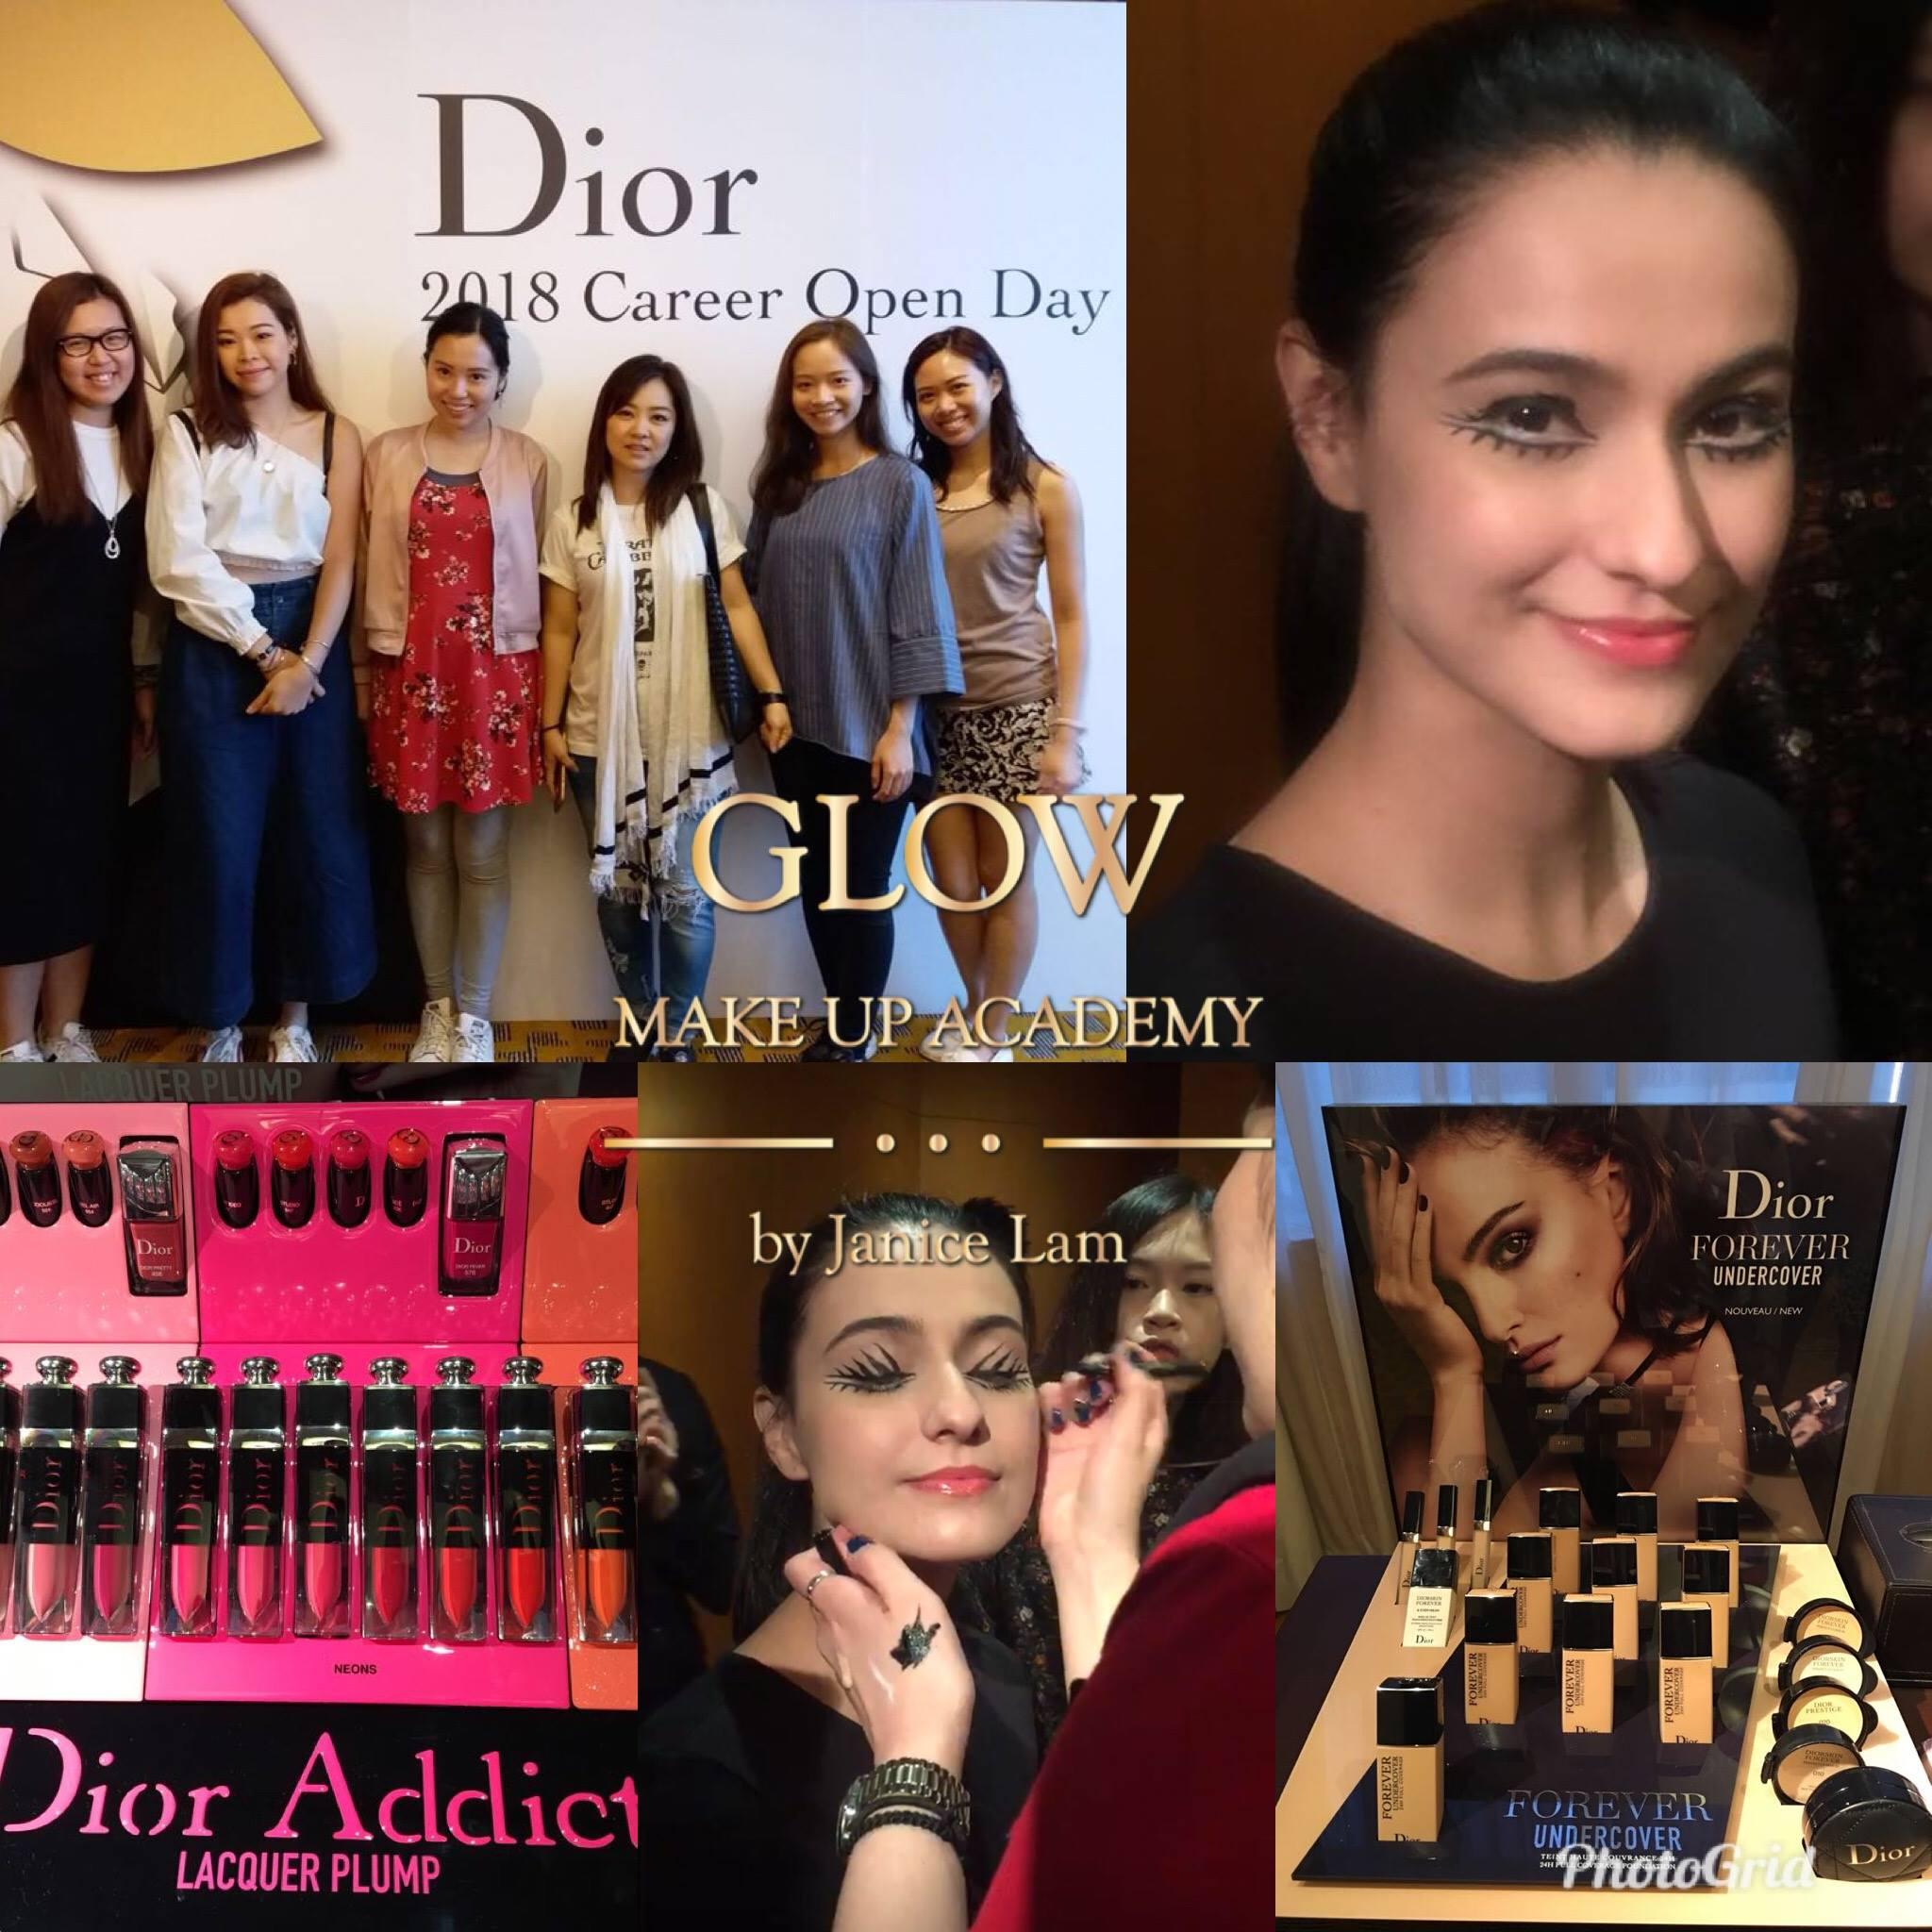 Dior recruitment